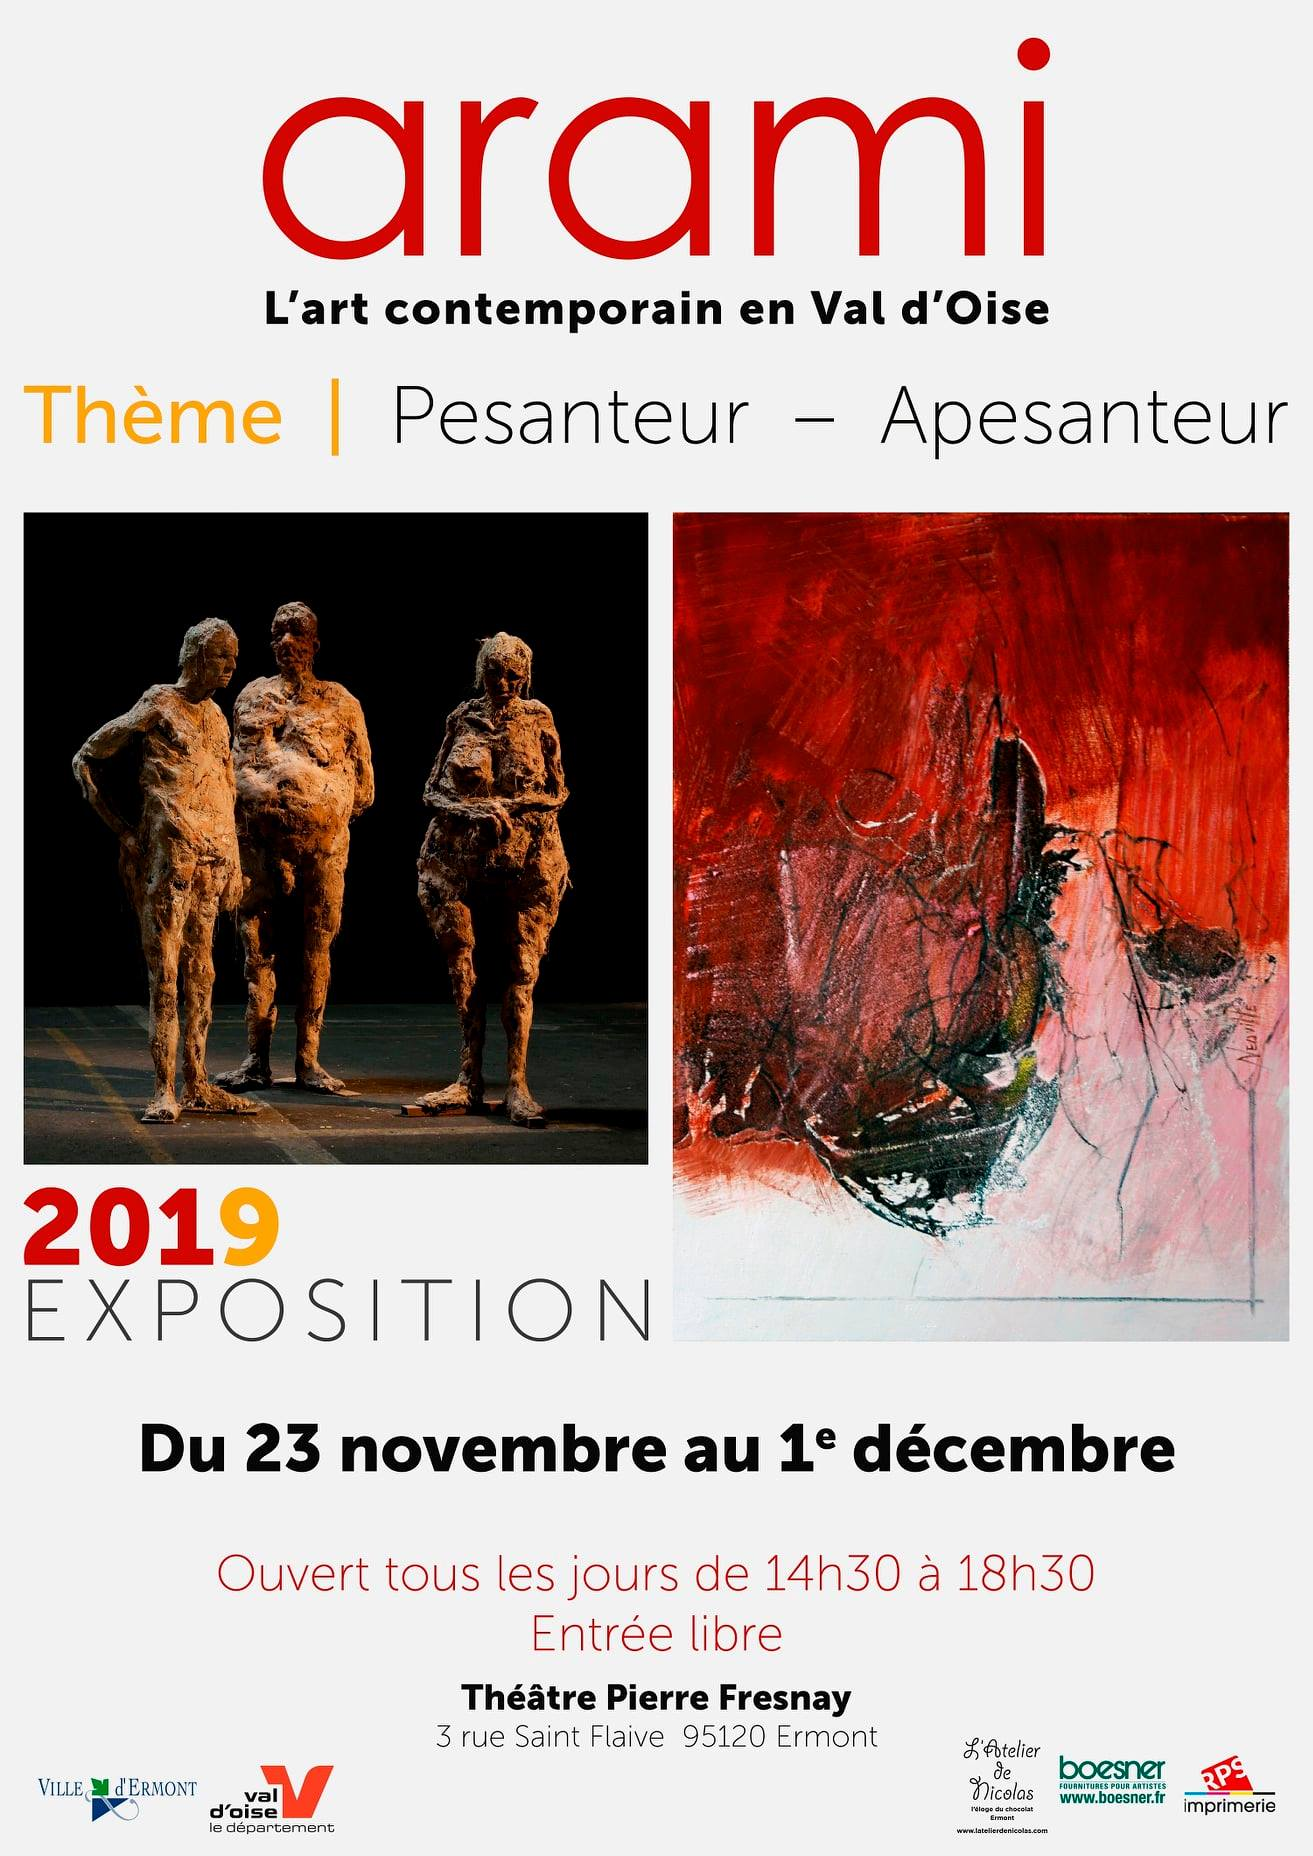 Exposition arami 2019